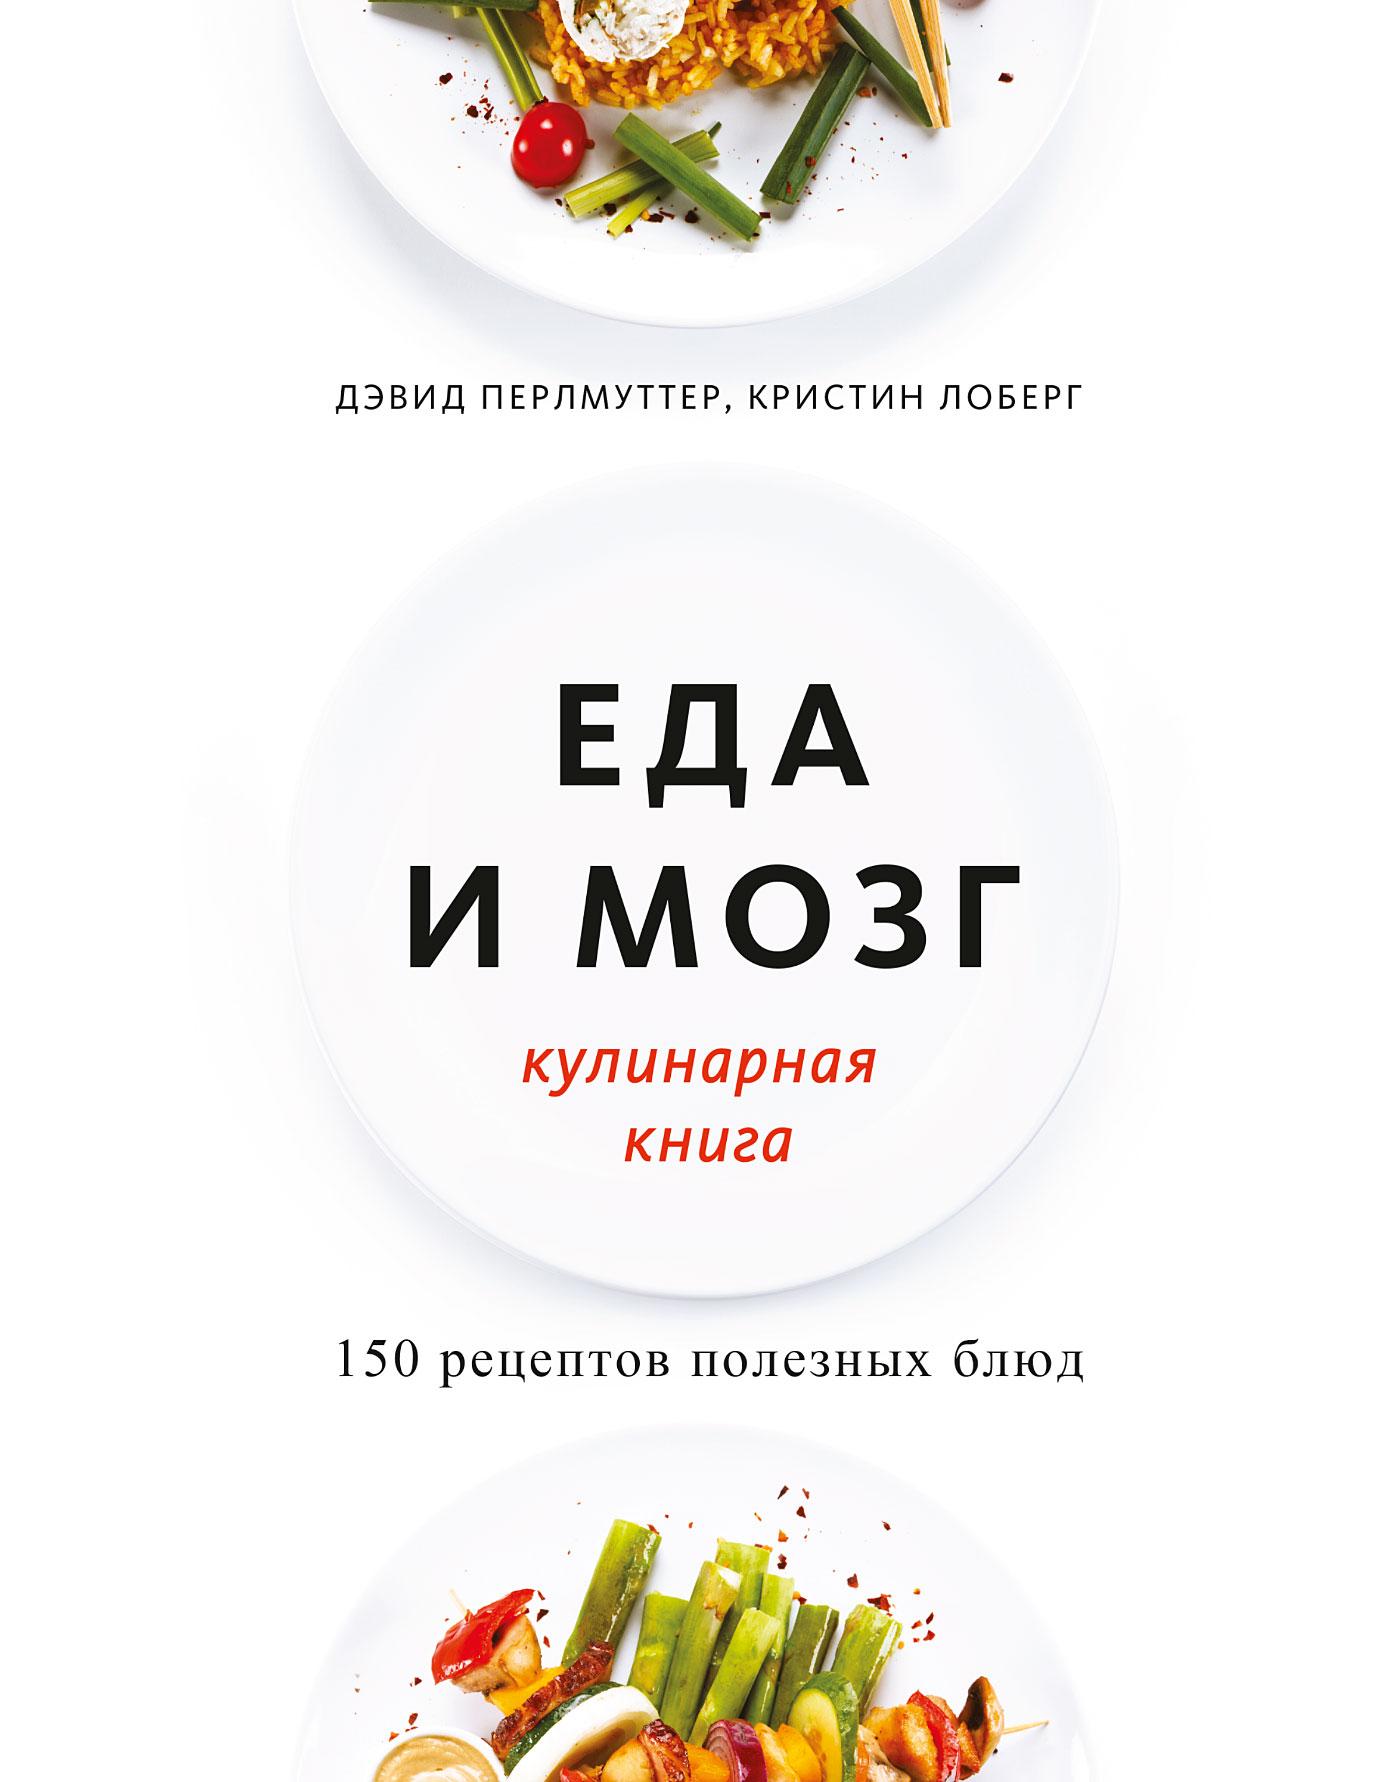 Дэвид Перлмуттер Еда и мозг. Кулинарная книга цена 2017